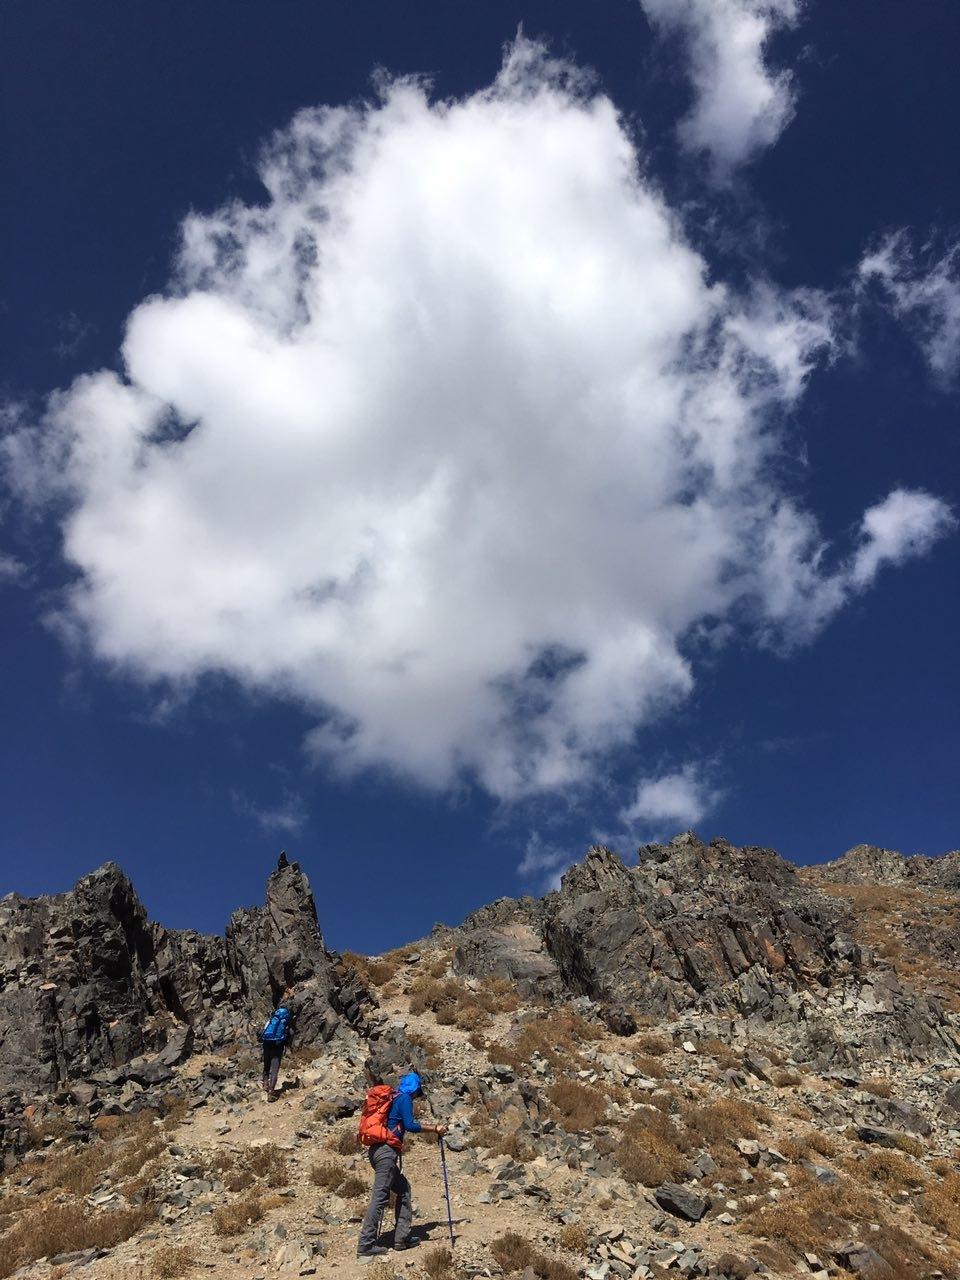 hiking by Majid Tarighati